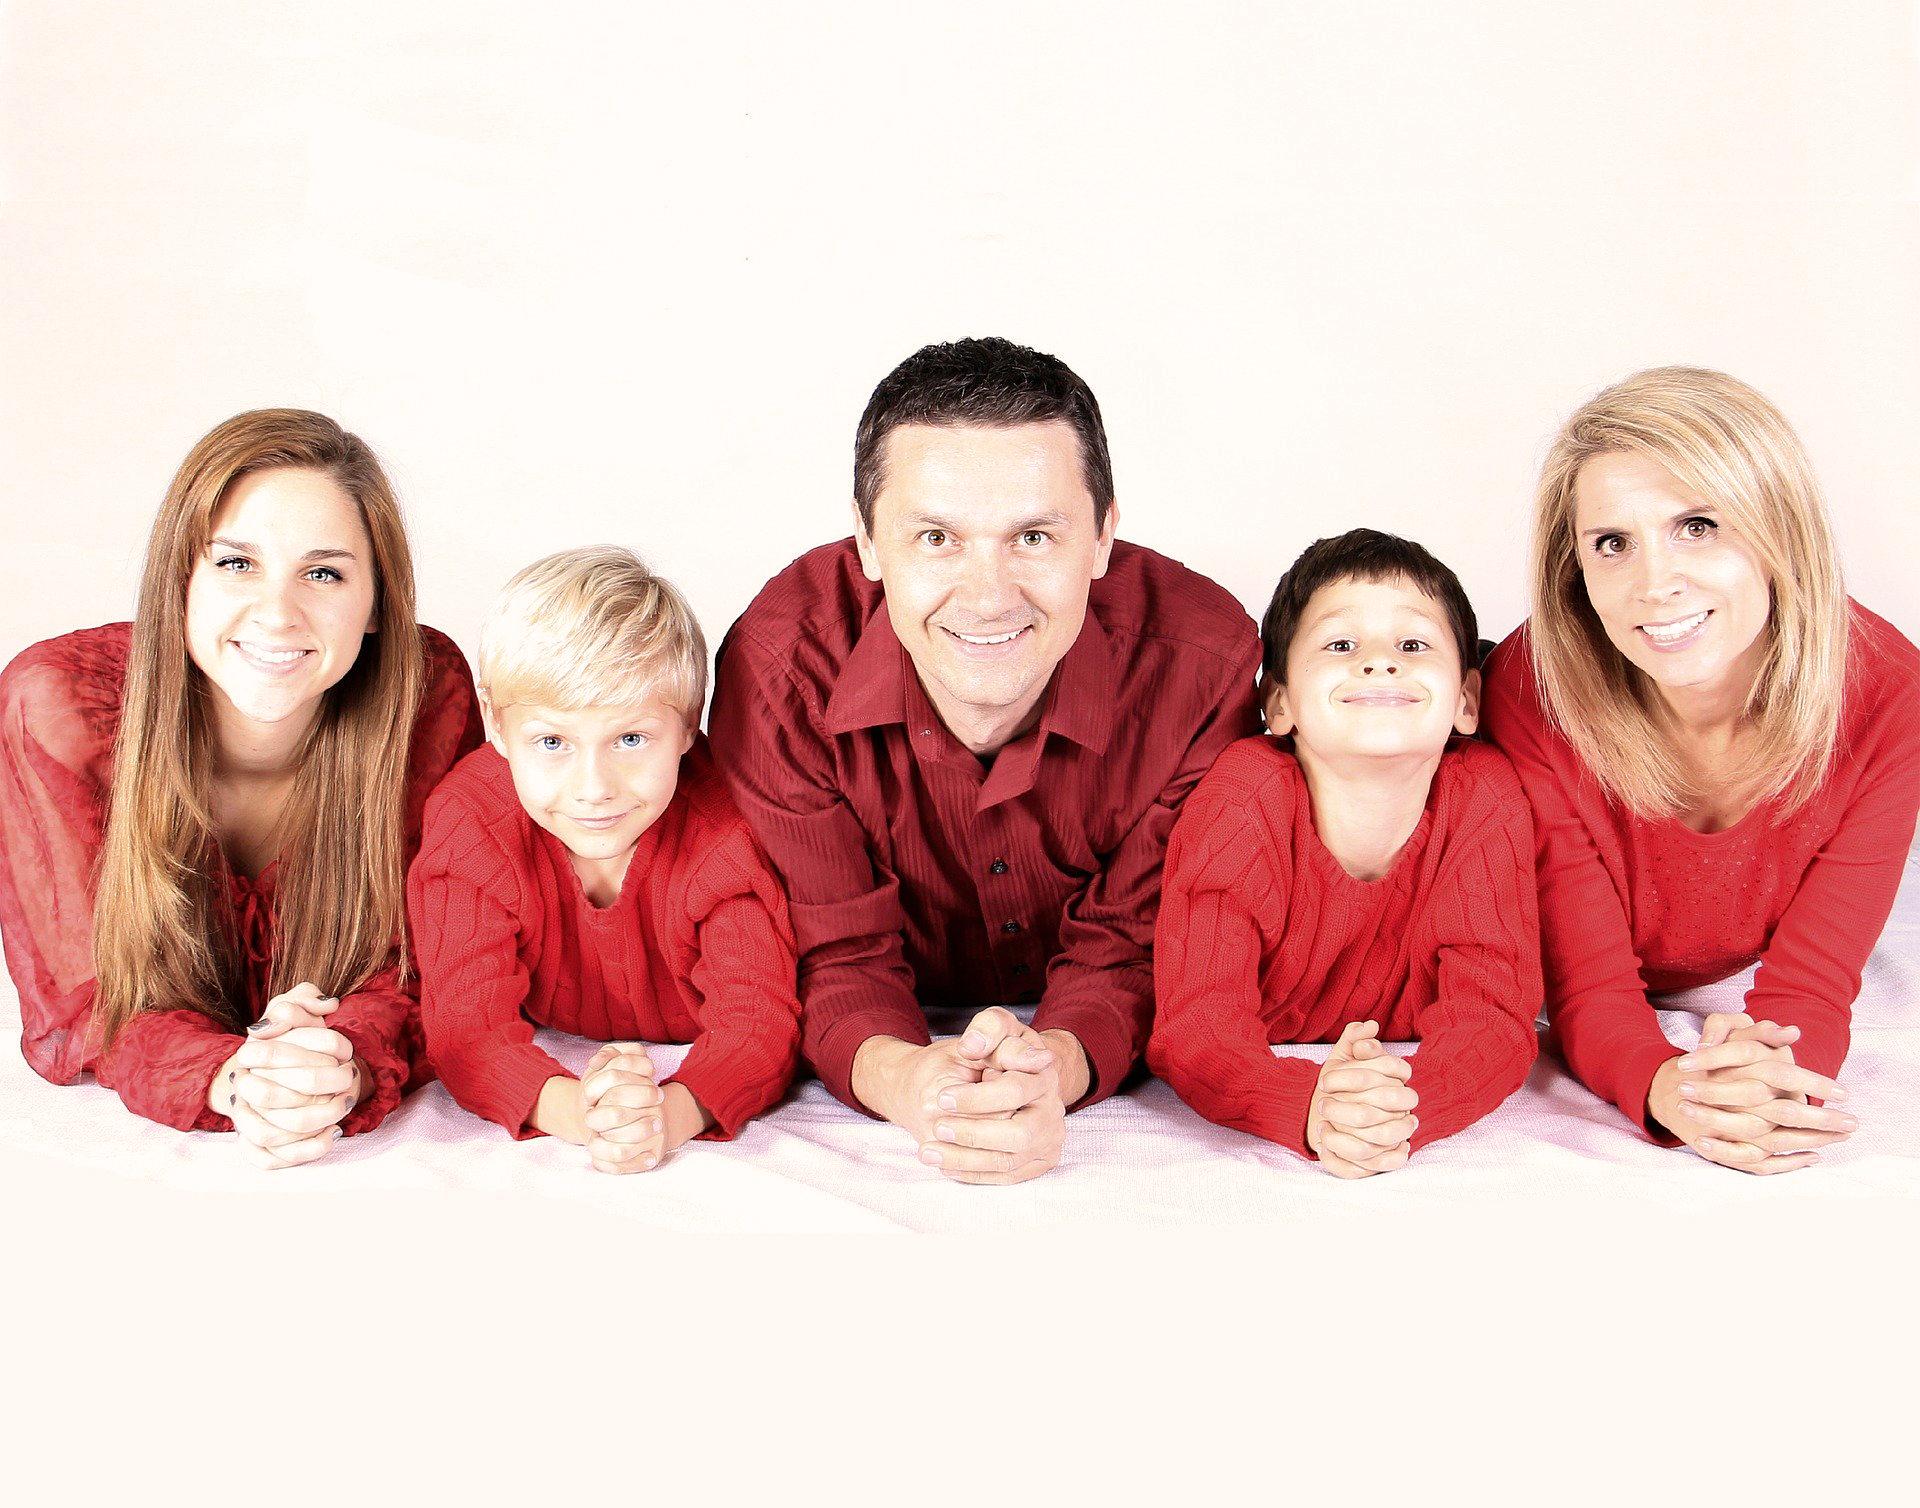 Family 521551 1920 Bild von White77 auf Pixabay farbe